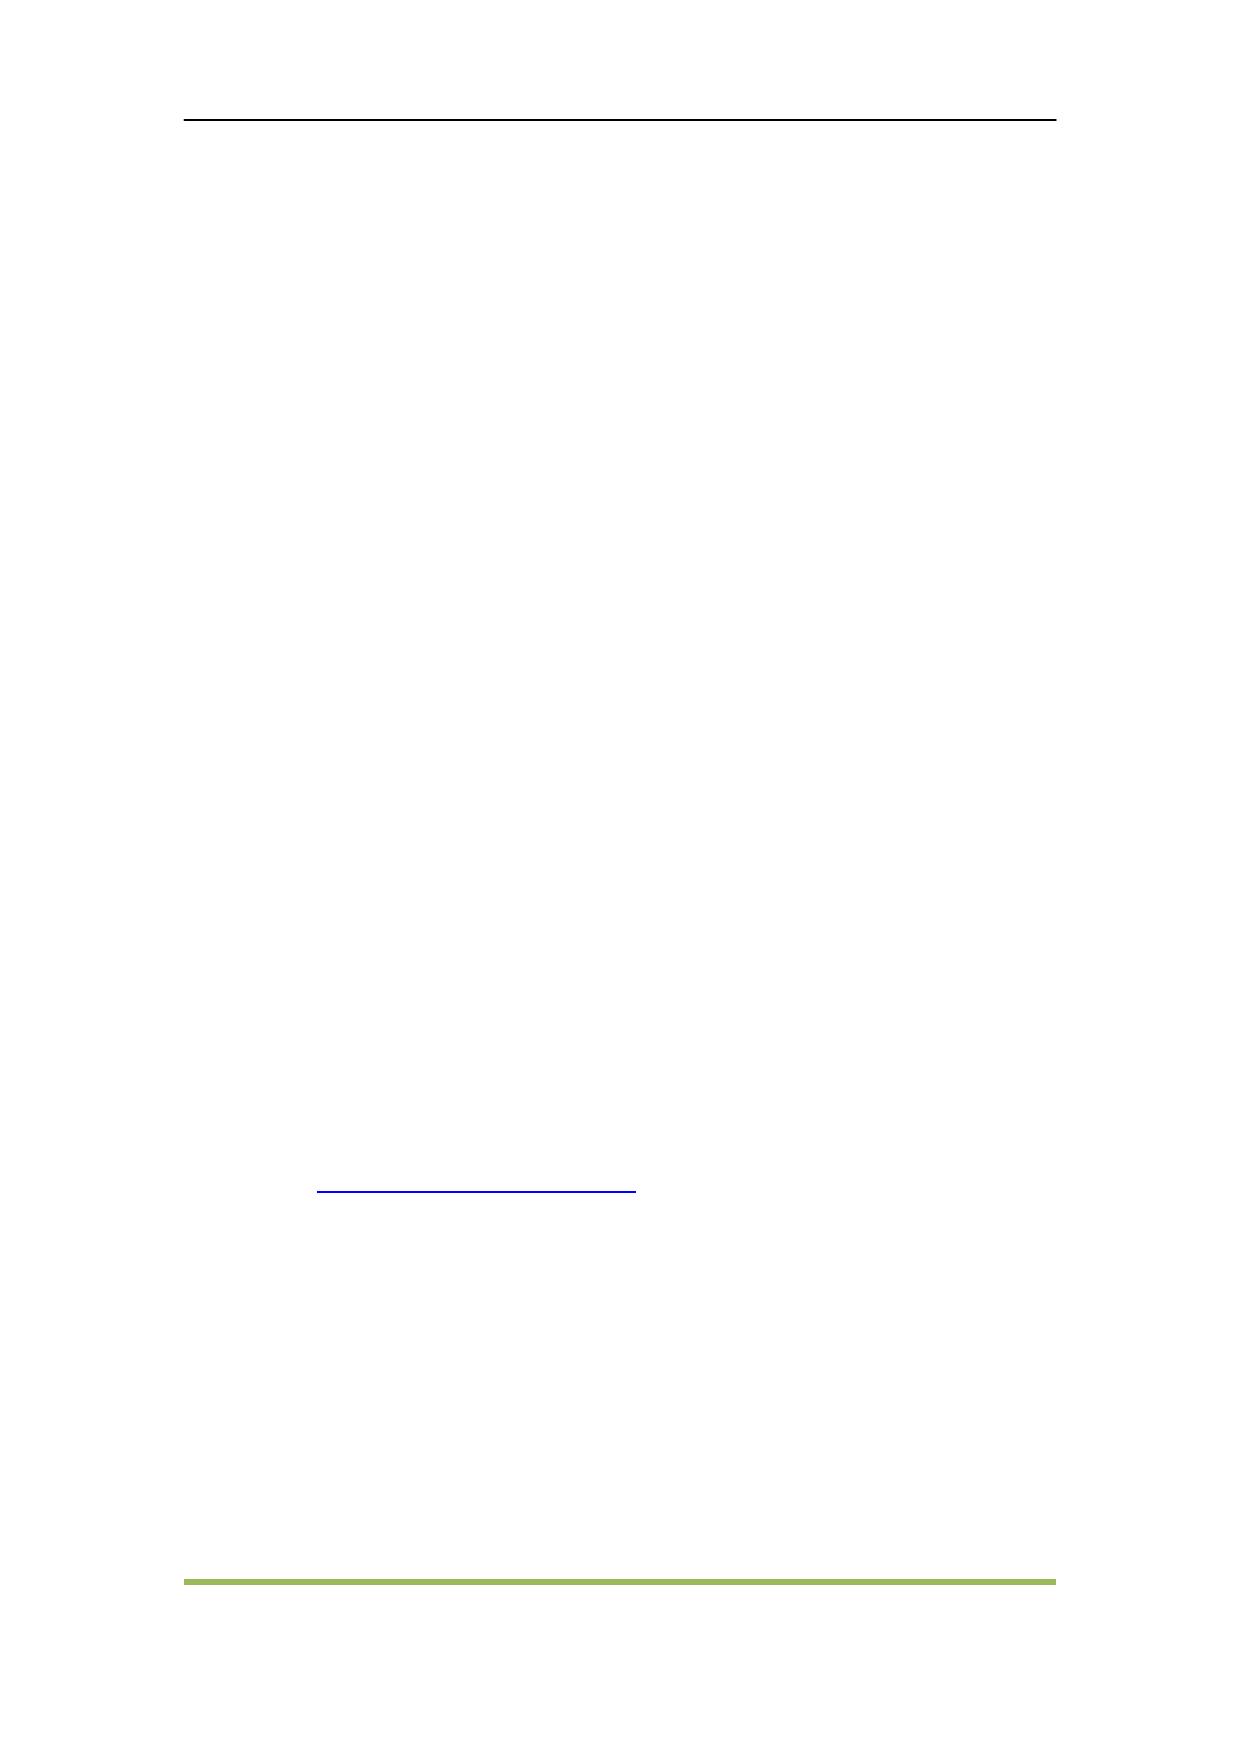 ND-JY2302 دیتاشیت PDF